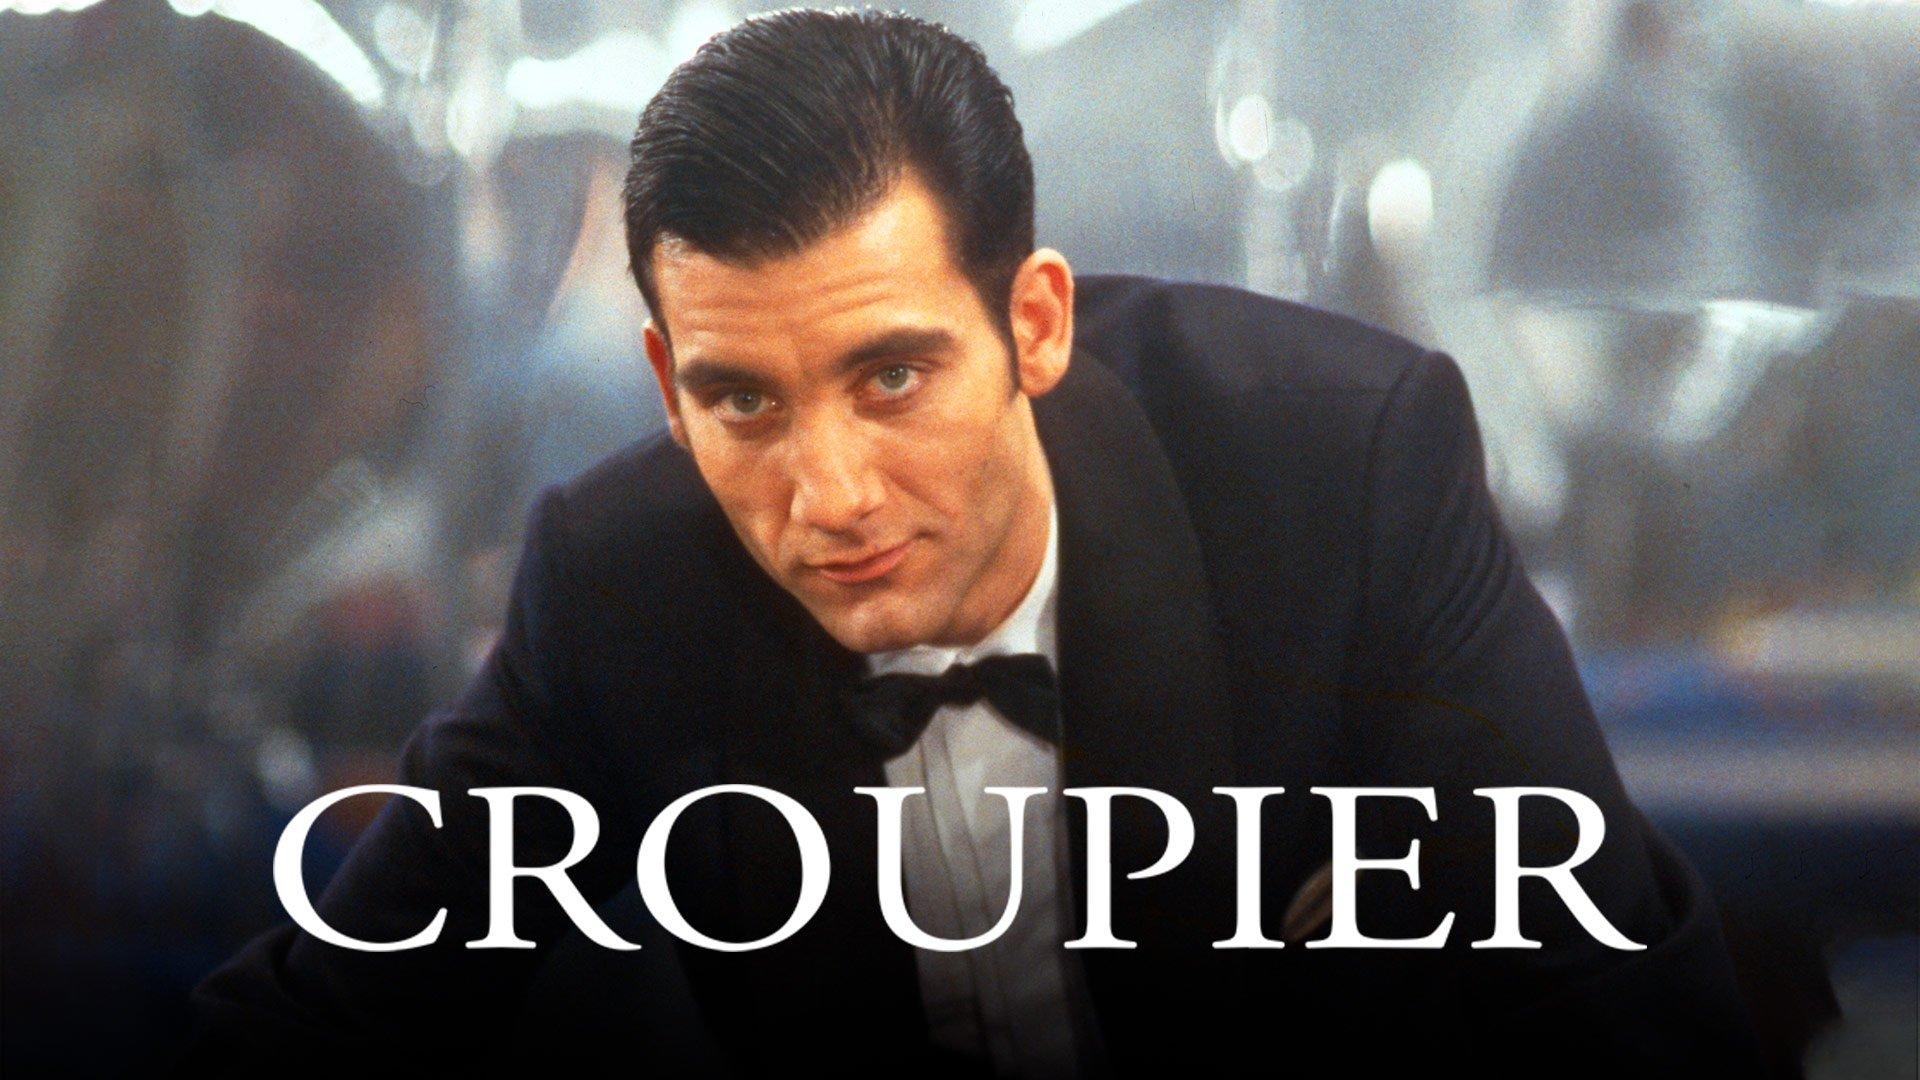 Croupier on BritBox UK